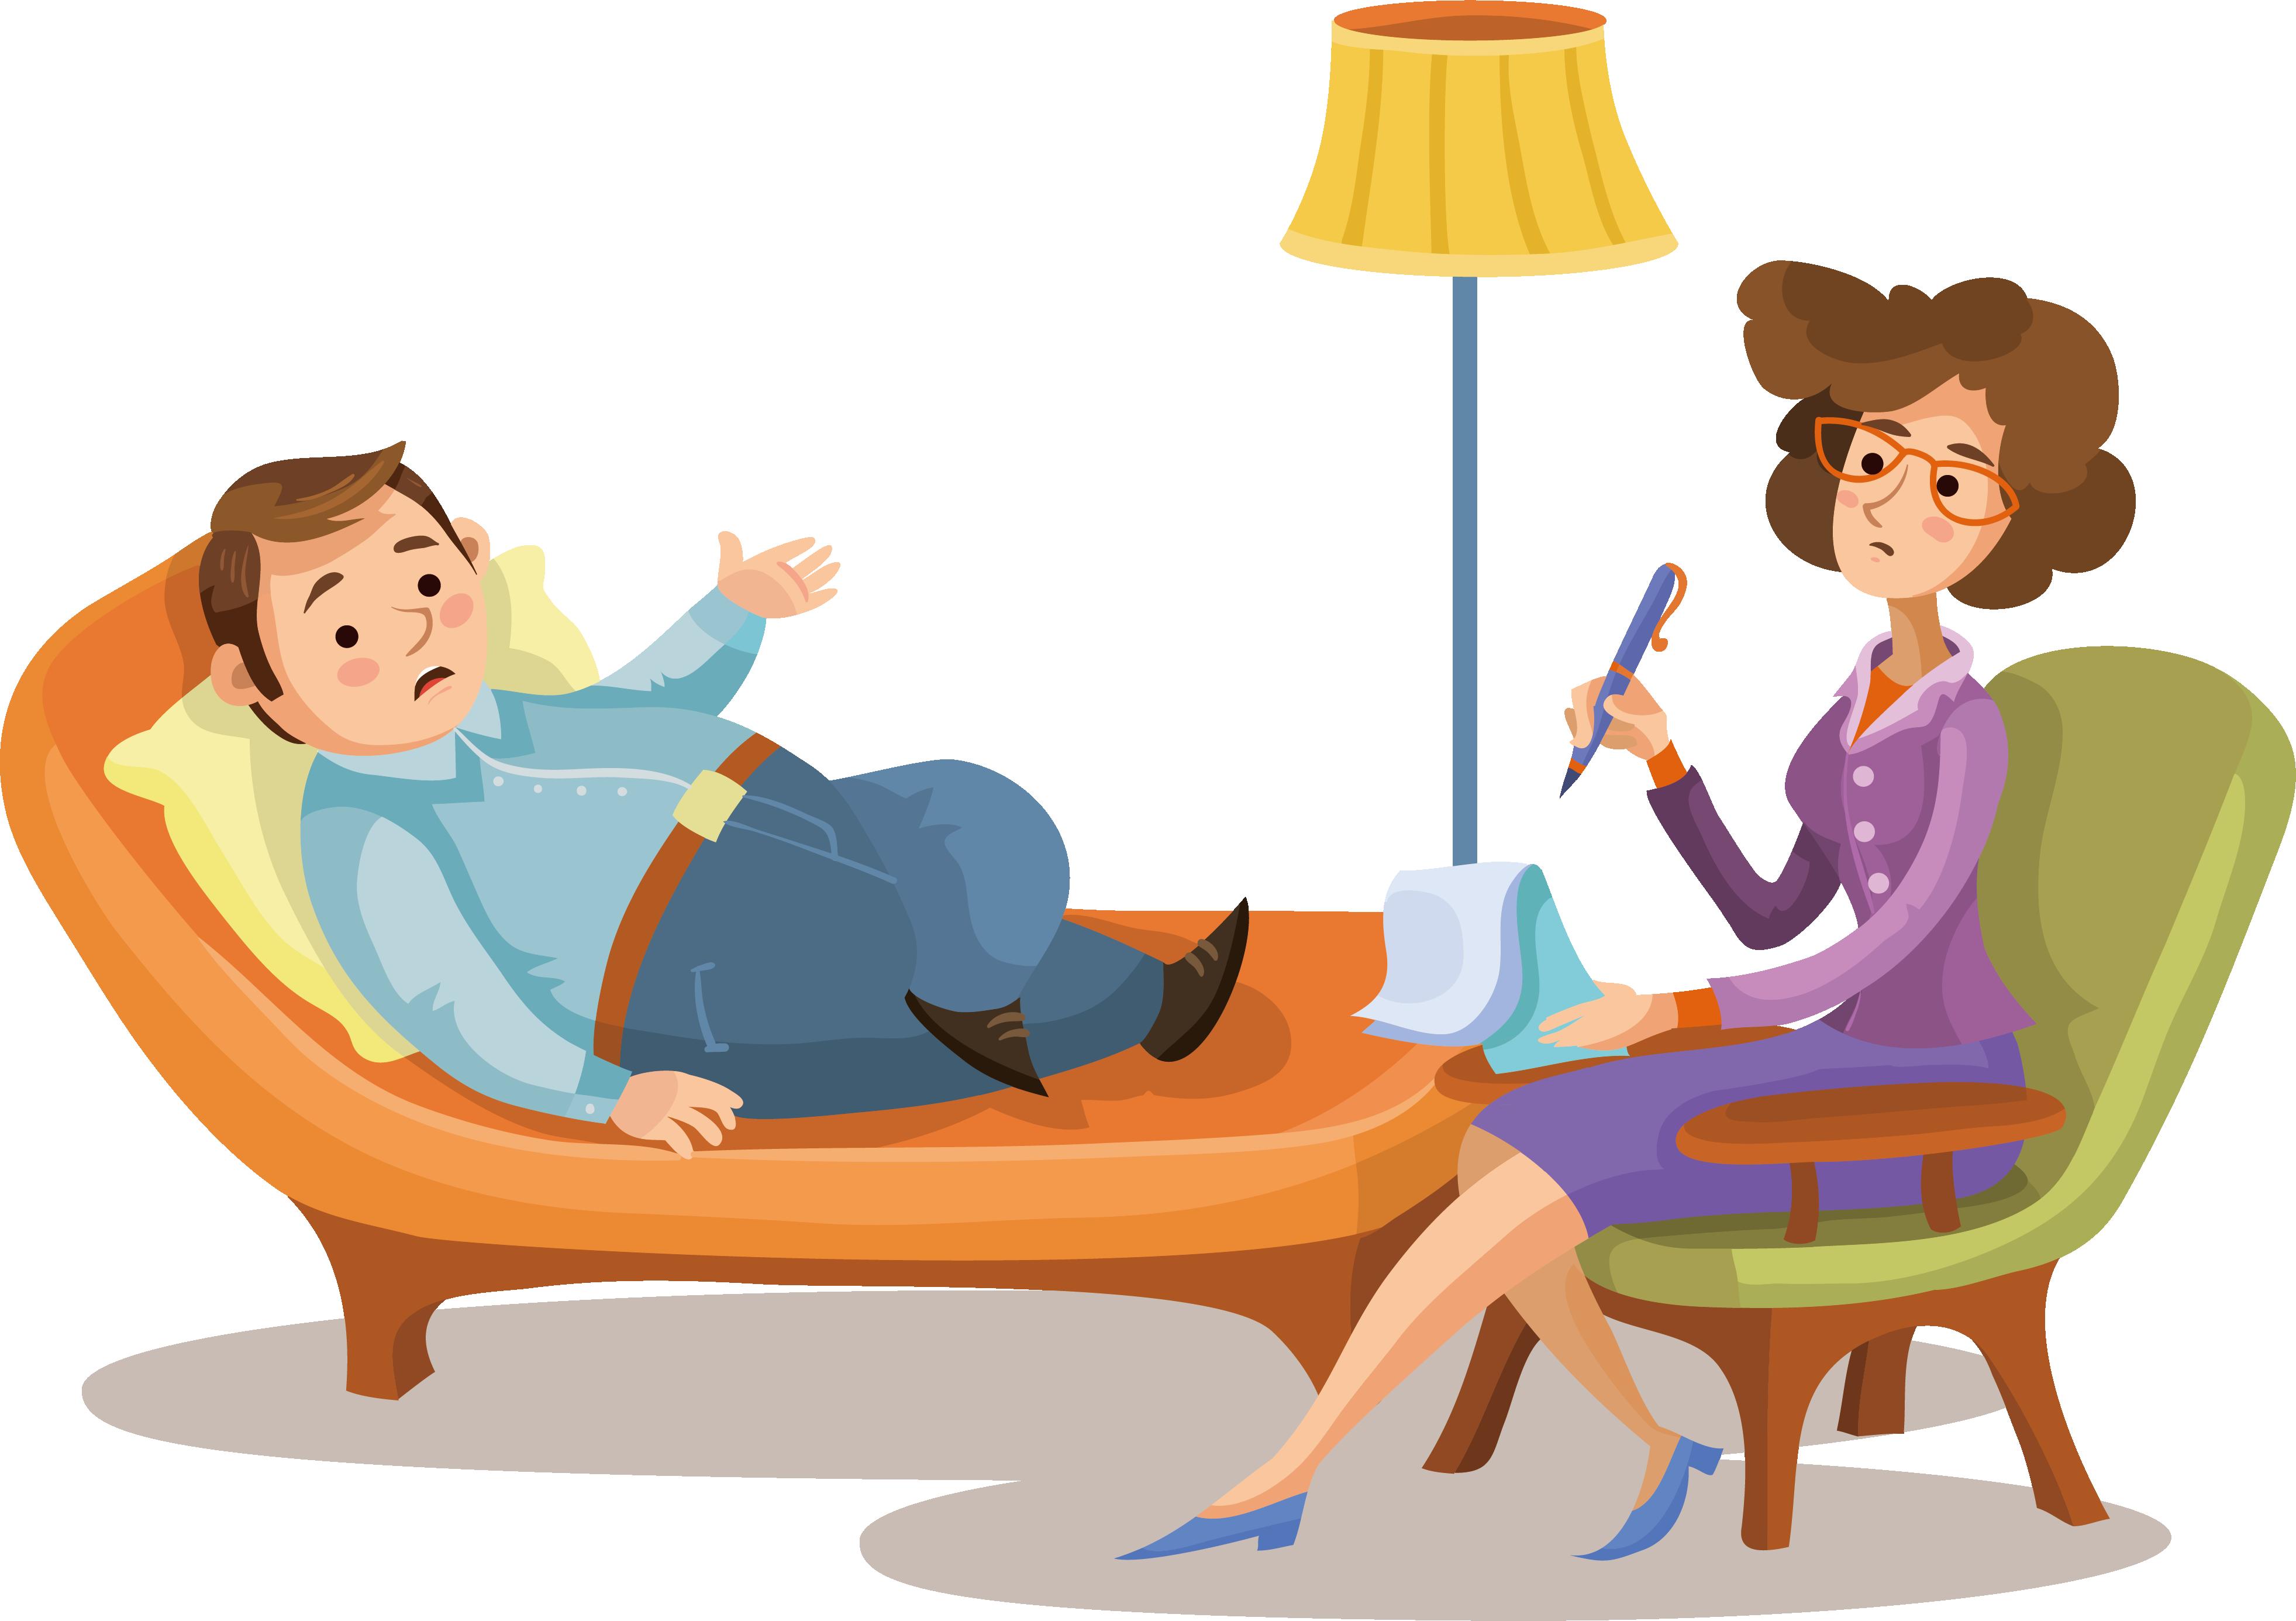 Psychotherapist cartoon psychologist illustration. Psychology clipart psychiatric patient